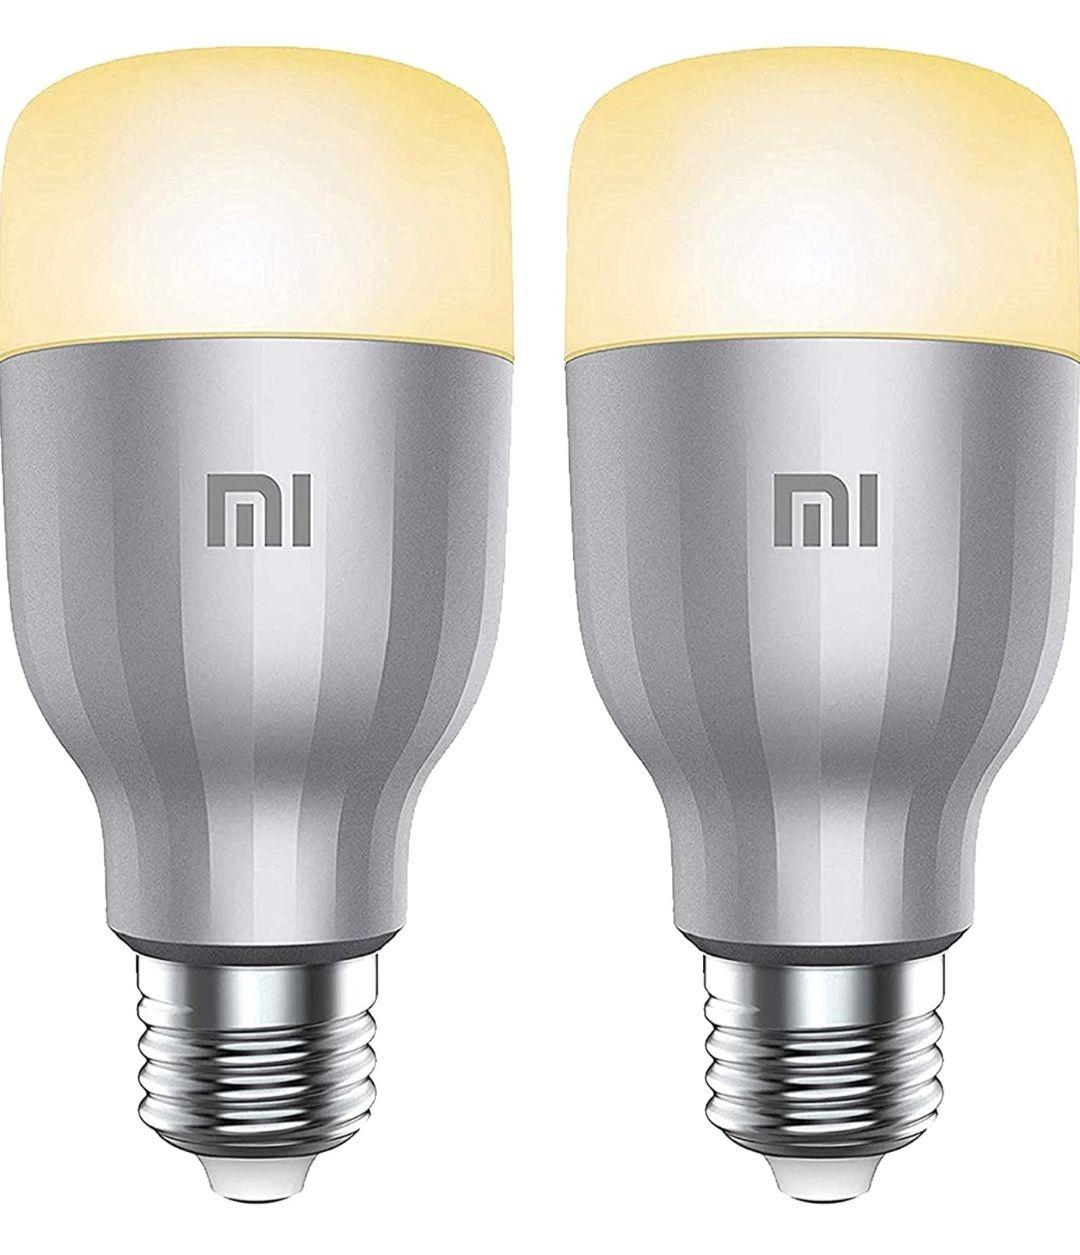 Xiaomi Mi LED Wi-Fi Enabled Smart Bulb E27 White & Colour, 10 W - 2 Pack - £17.03 (+£4.49 Non Prime) @ Amazon